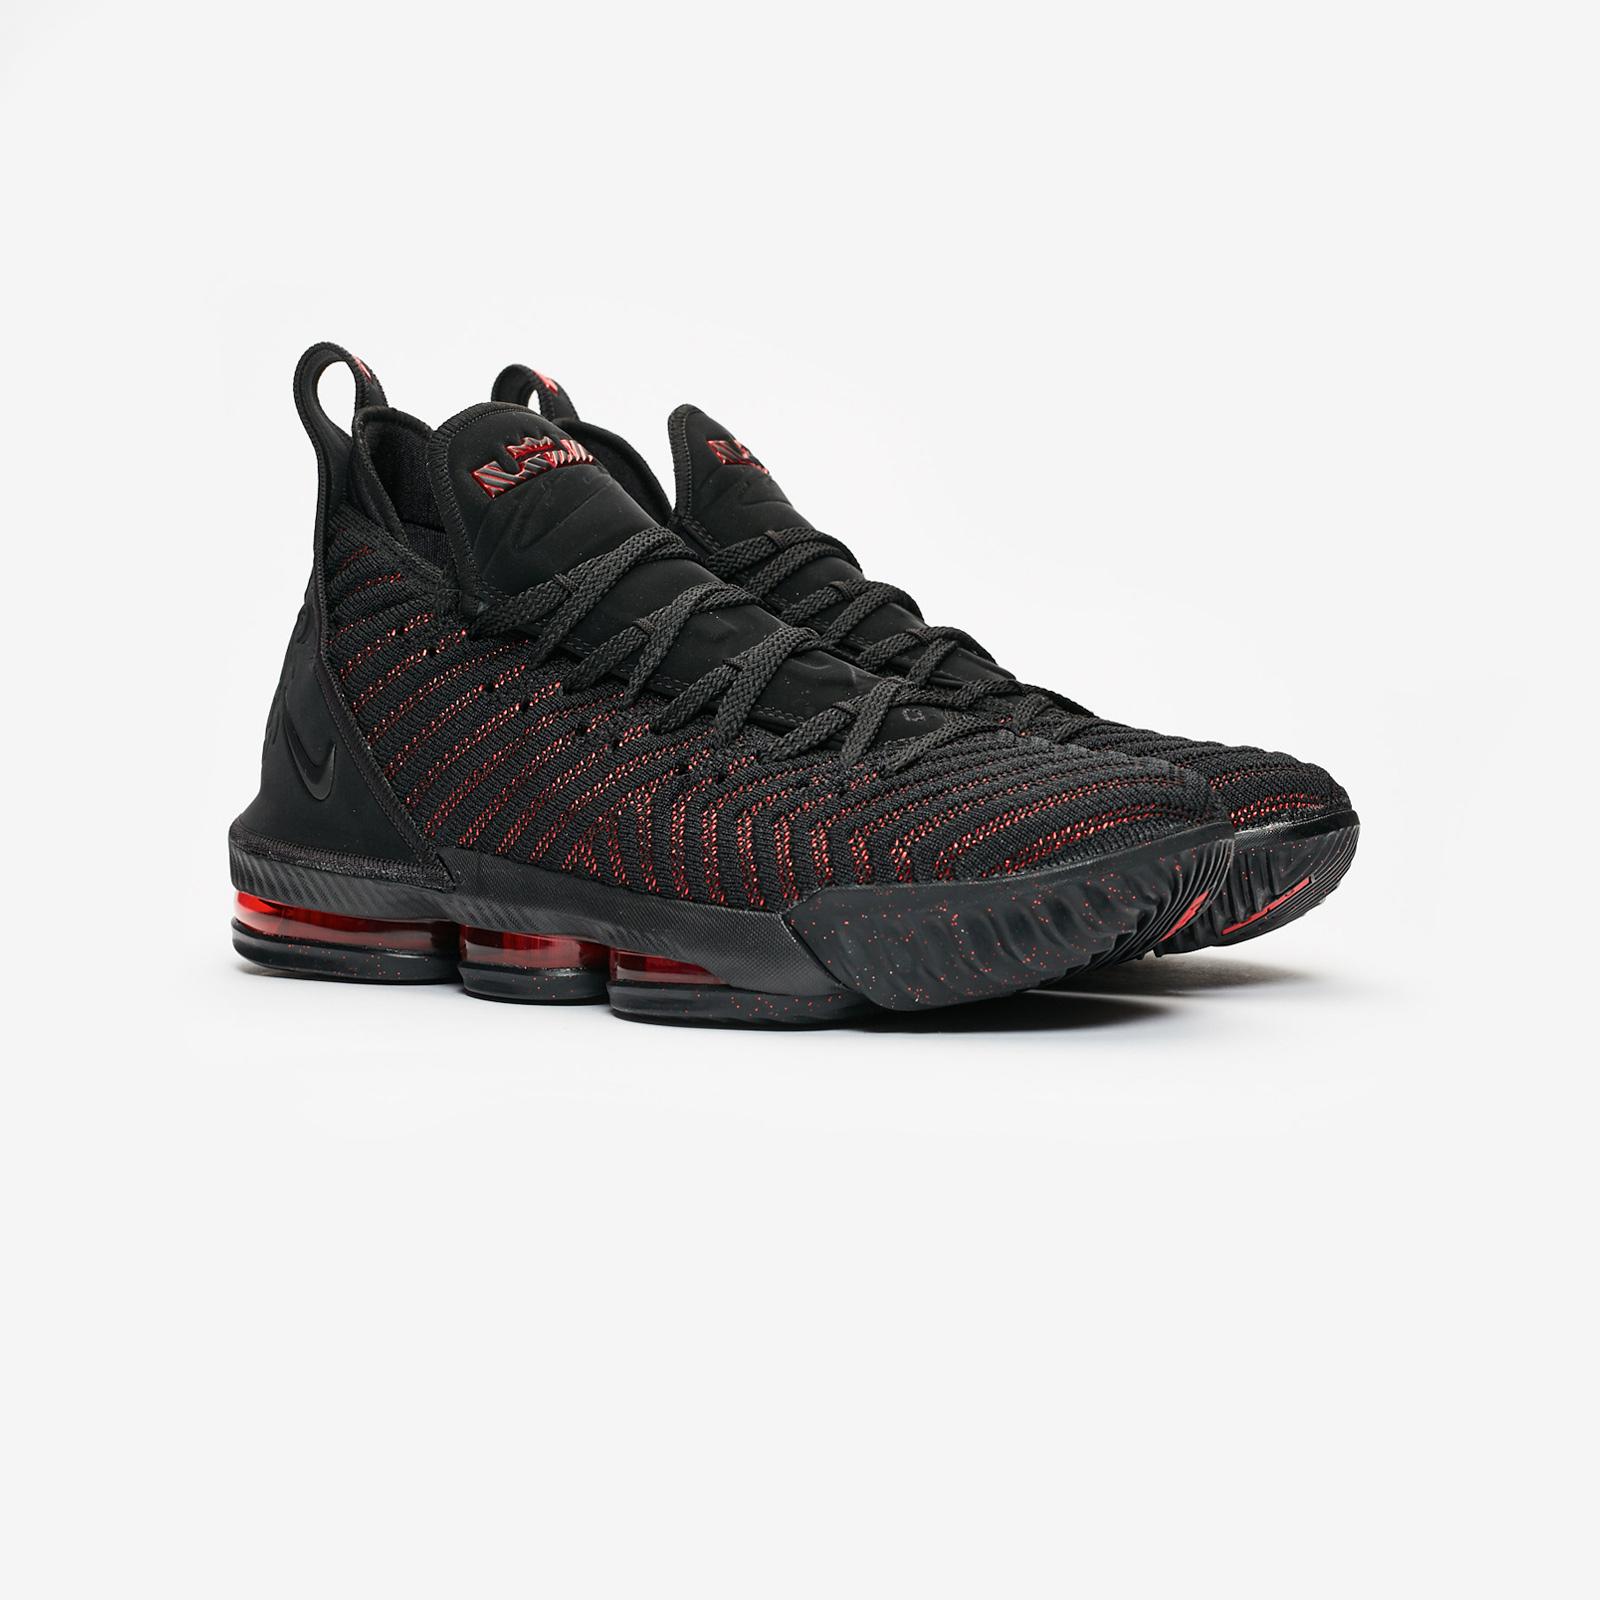 Nike LeBron XVI - Ao2588-002 - Sneakersnstuff  a3bb2b00d